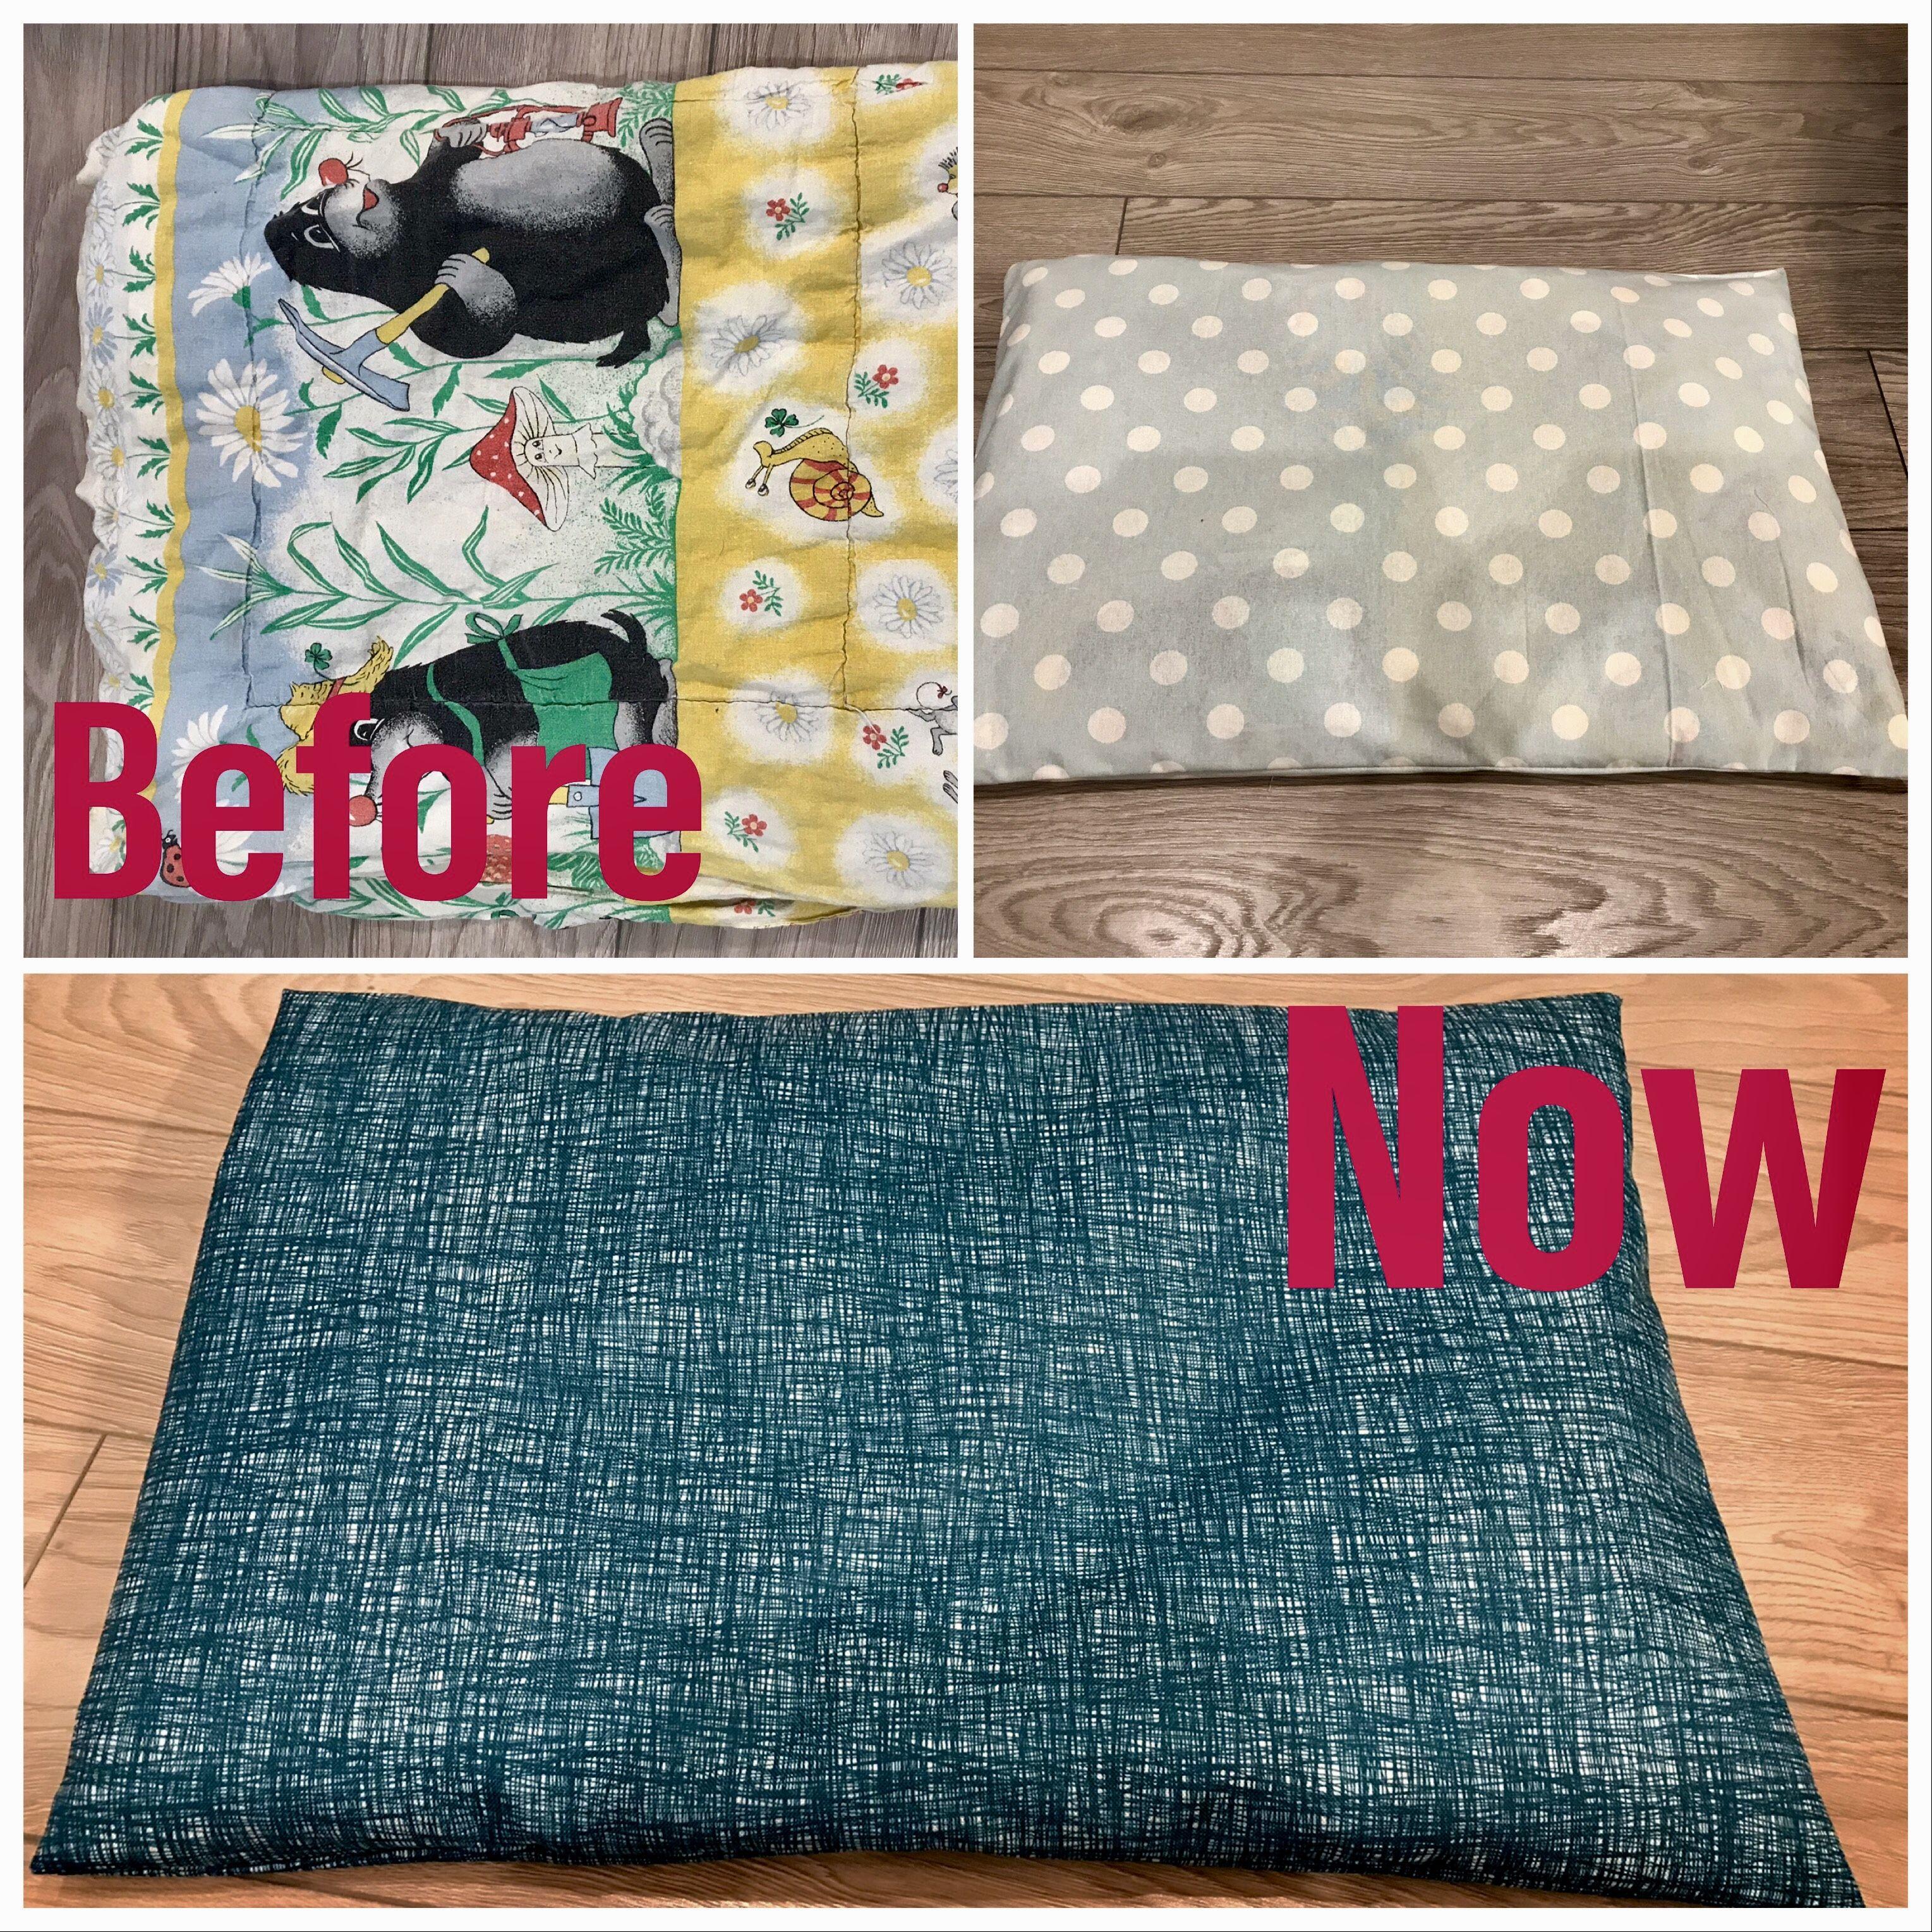 Renew dog pillow Dog pillow, Outdoor blanket, Picnic blanket